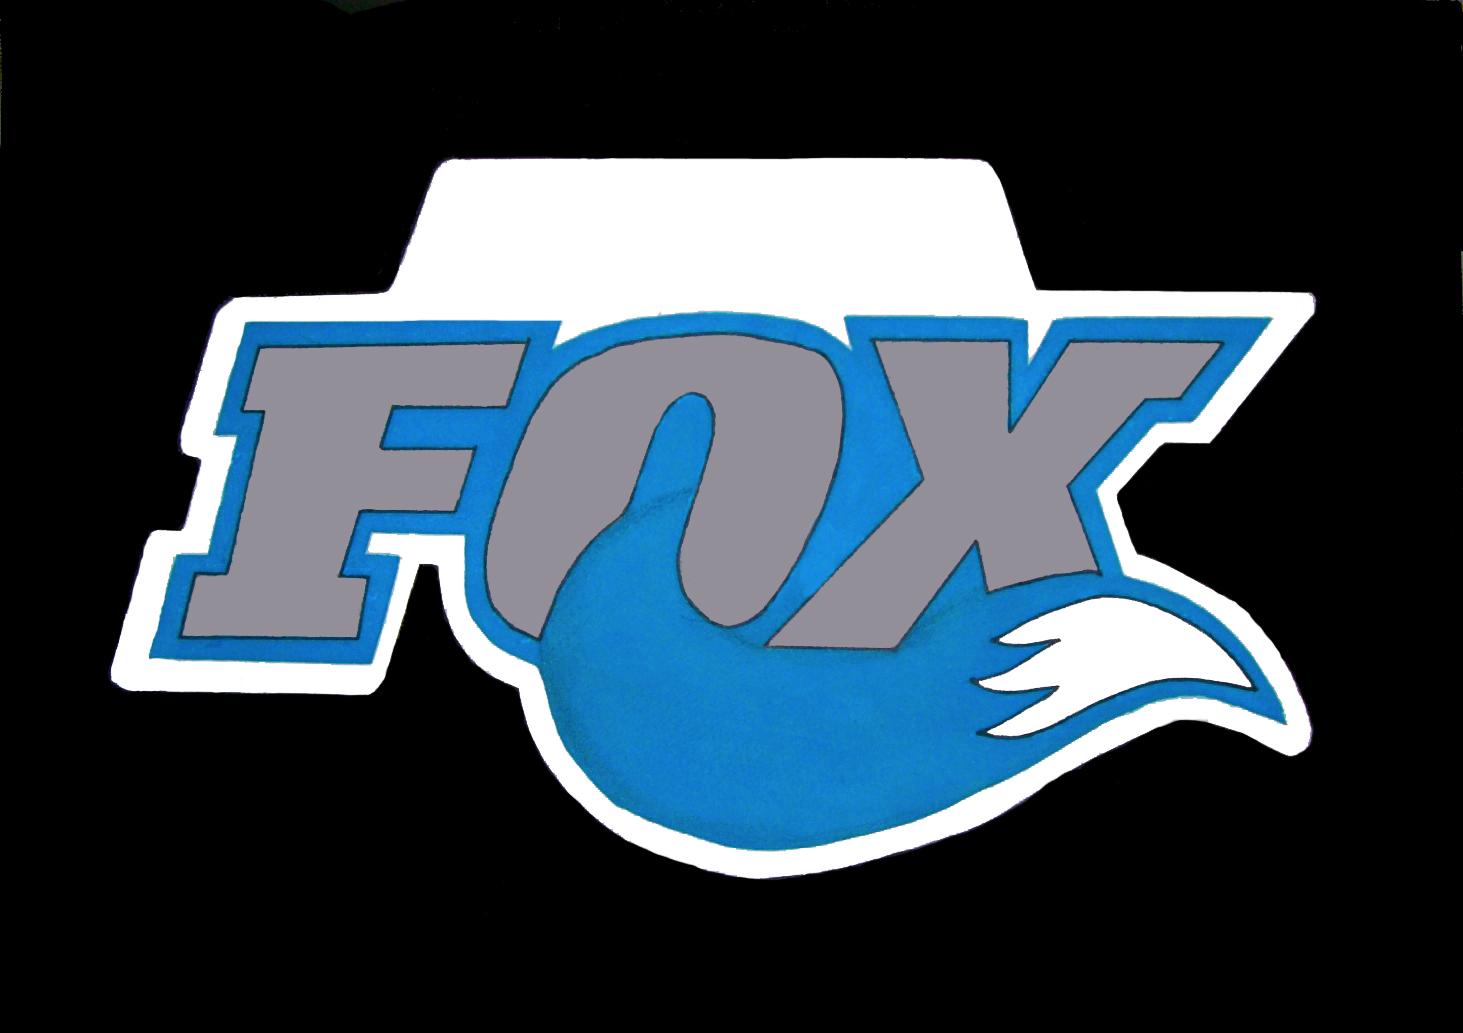 http://3.bp.blogspot.com/_rkp35kQkHYQ/S_oHg7vDrcI/AAAAAAAAACM/RXgHyWkGyII/s1600/fox+logo.jpg